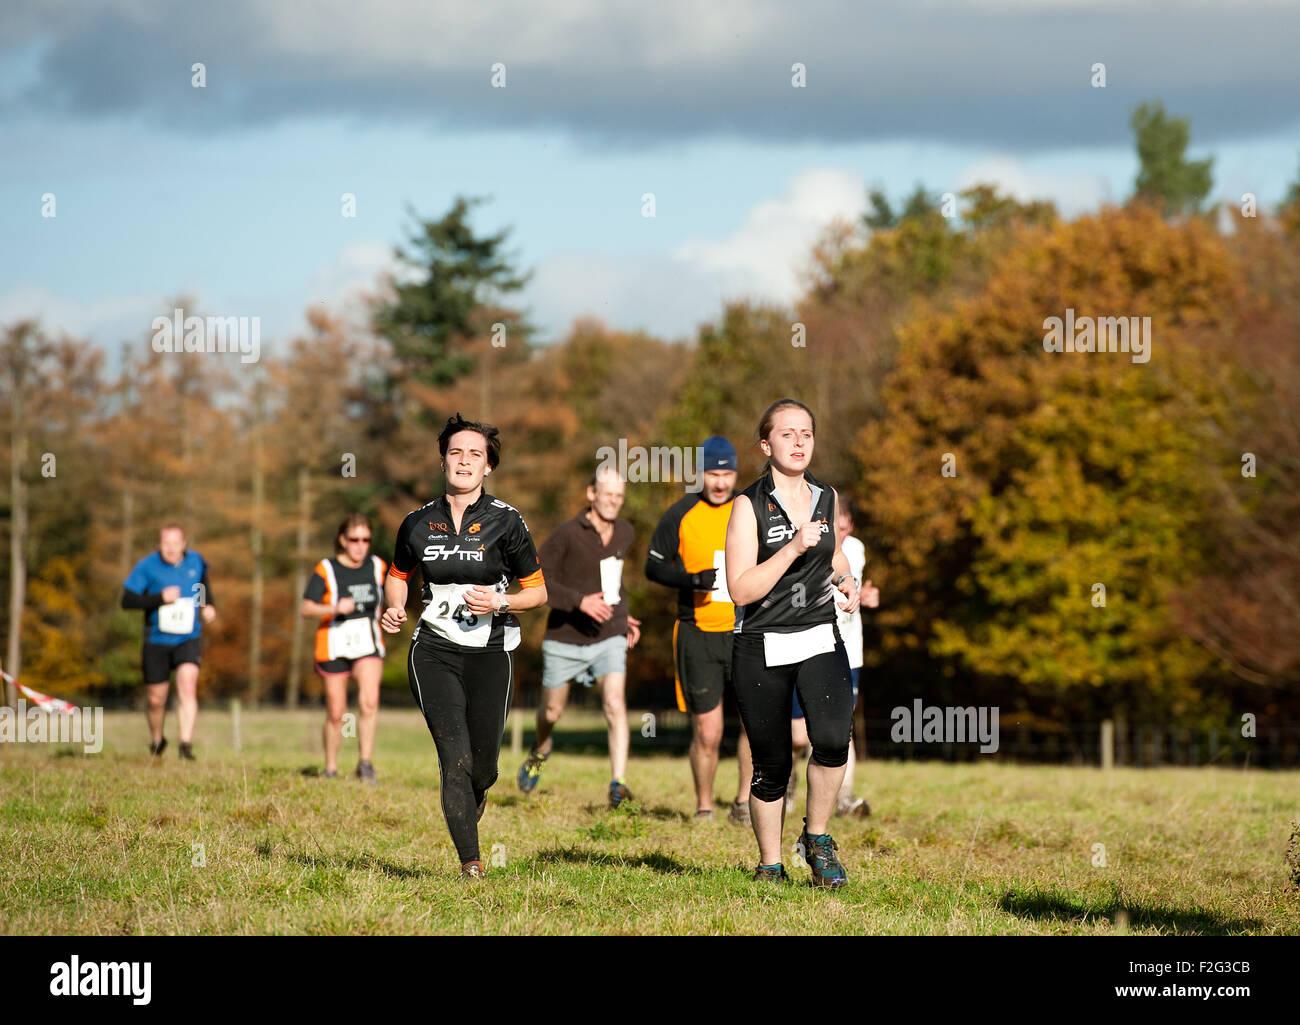 Cross Country corredores cruzando un campo en otoño Sol Imagen De Stock